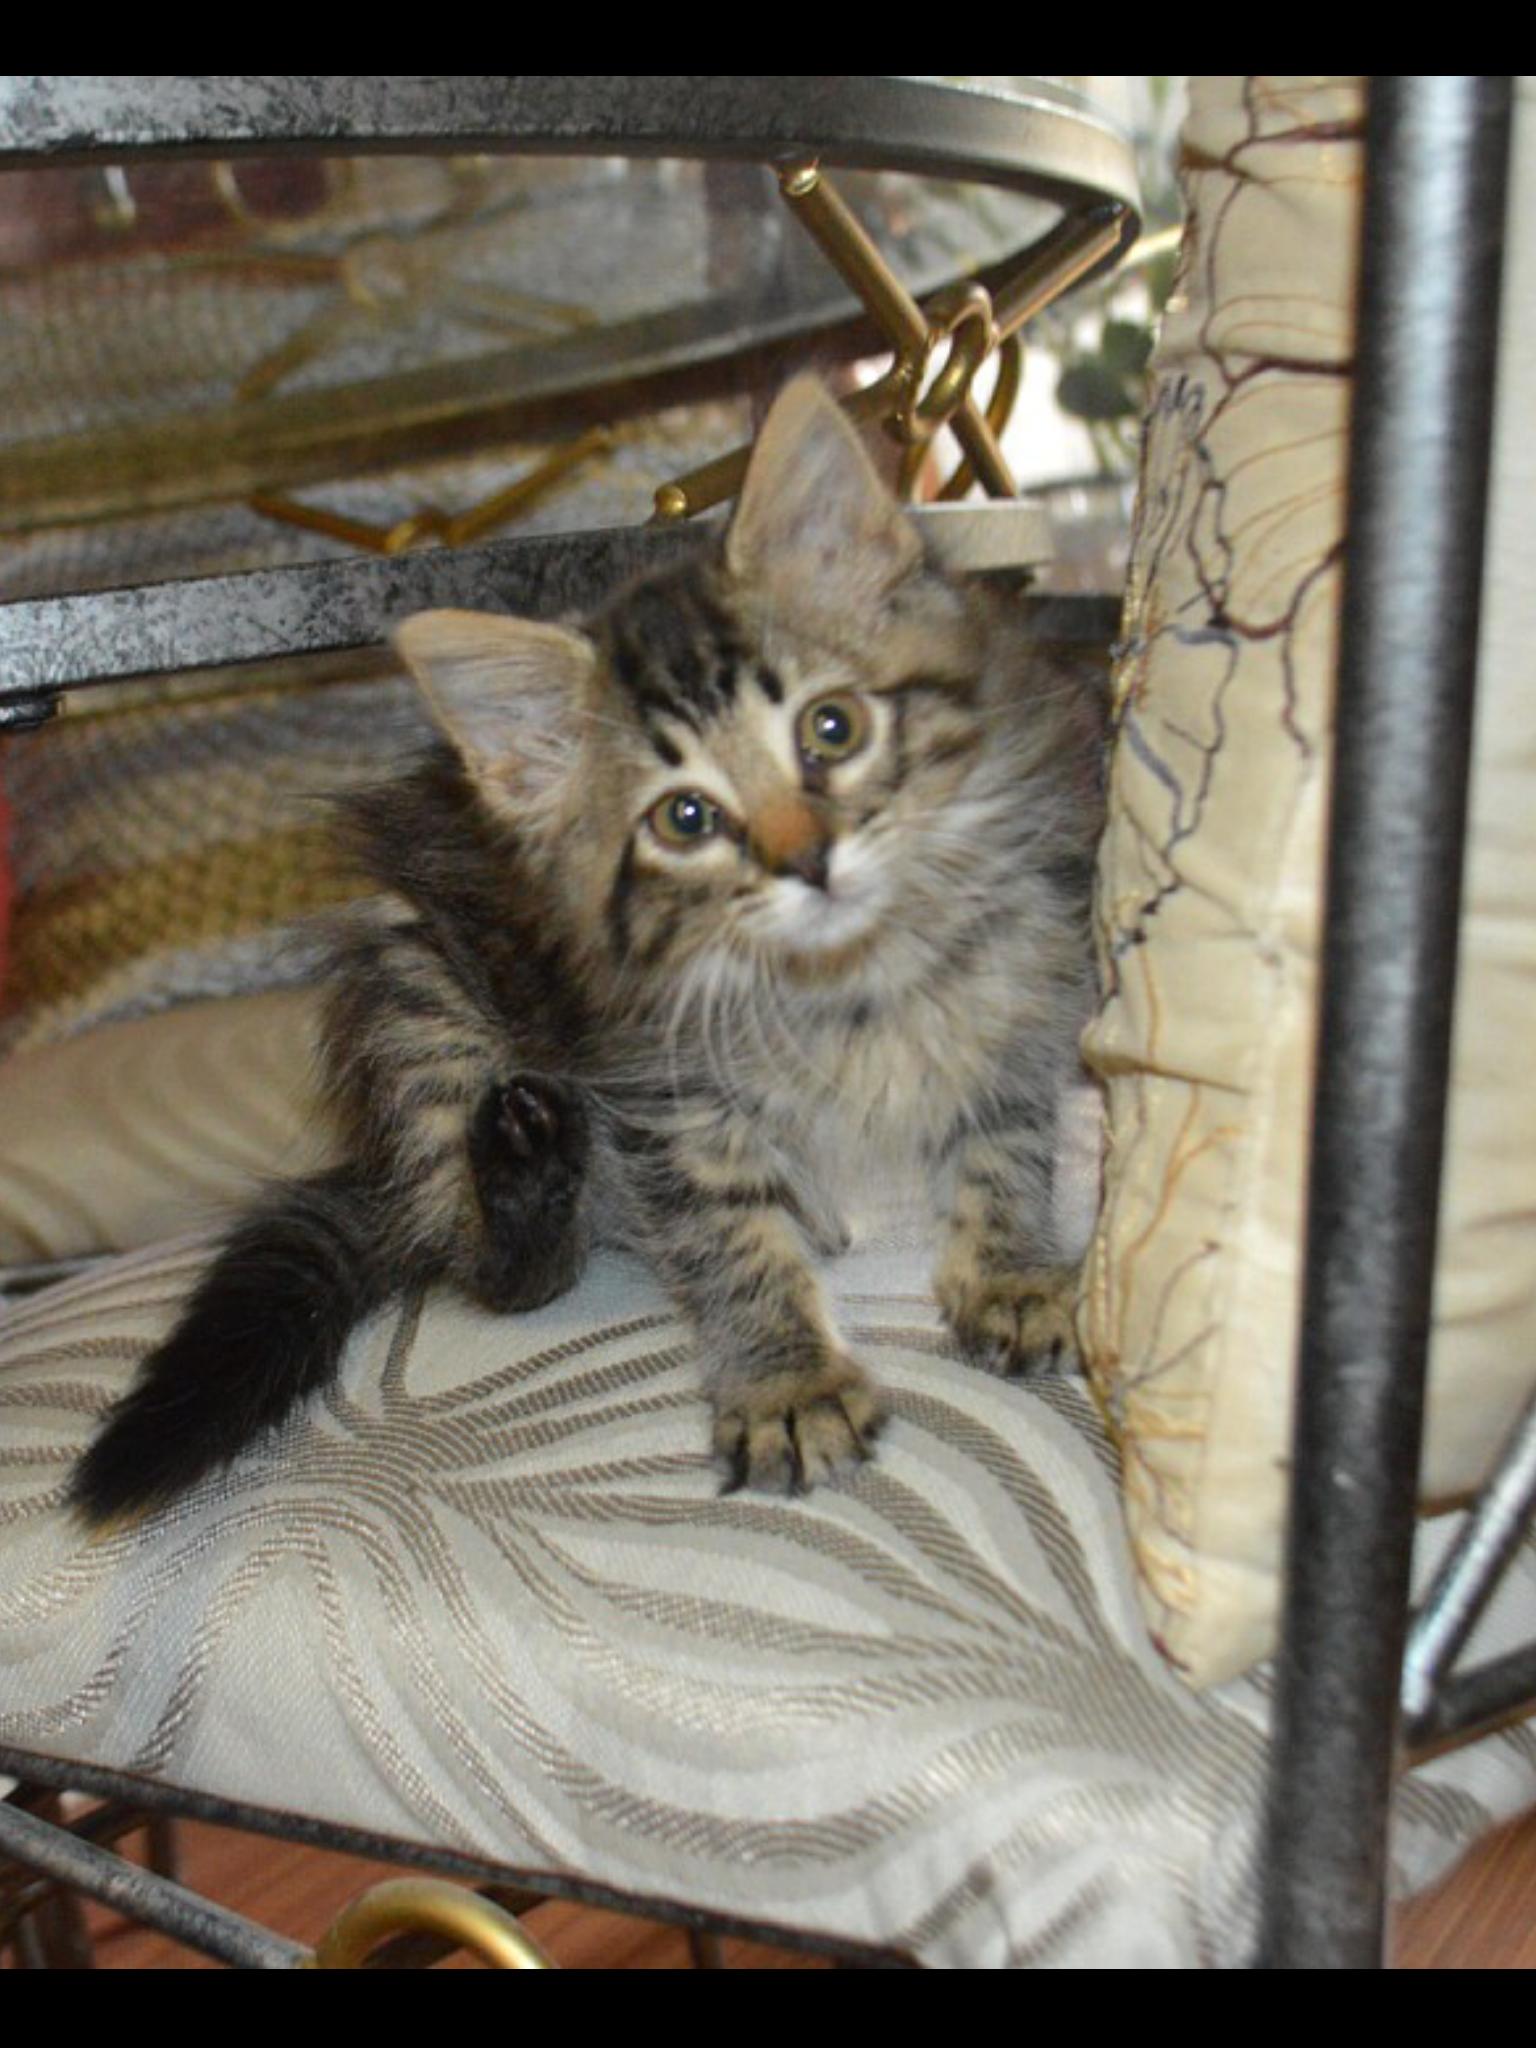 Sweet baby cat Baby cats, Cats, Animals